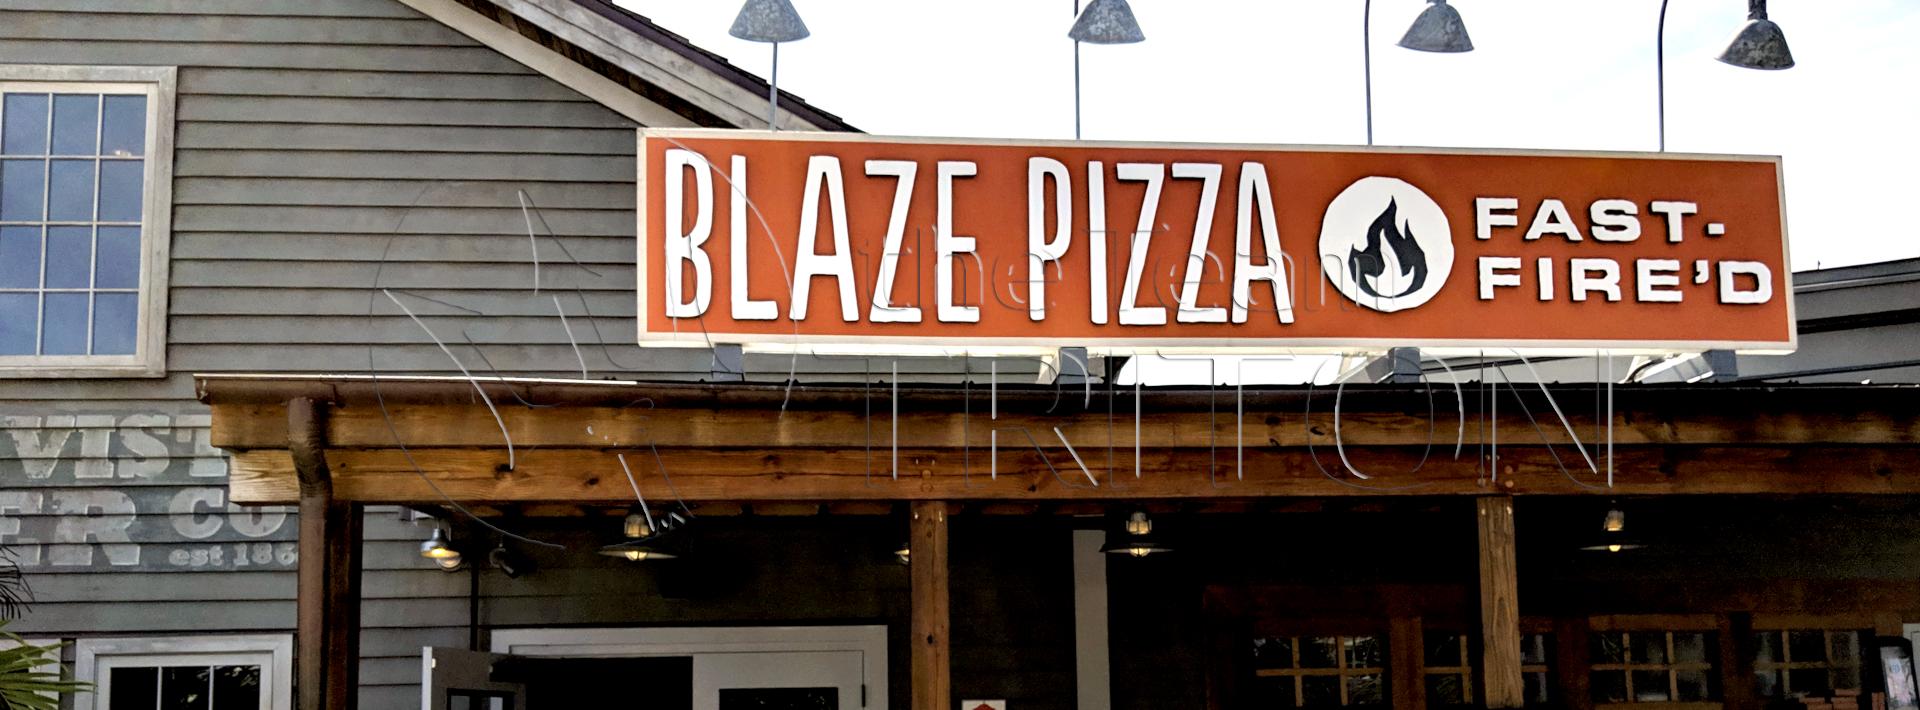 Disney Springs Blaze Pizza Exterior Marquee